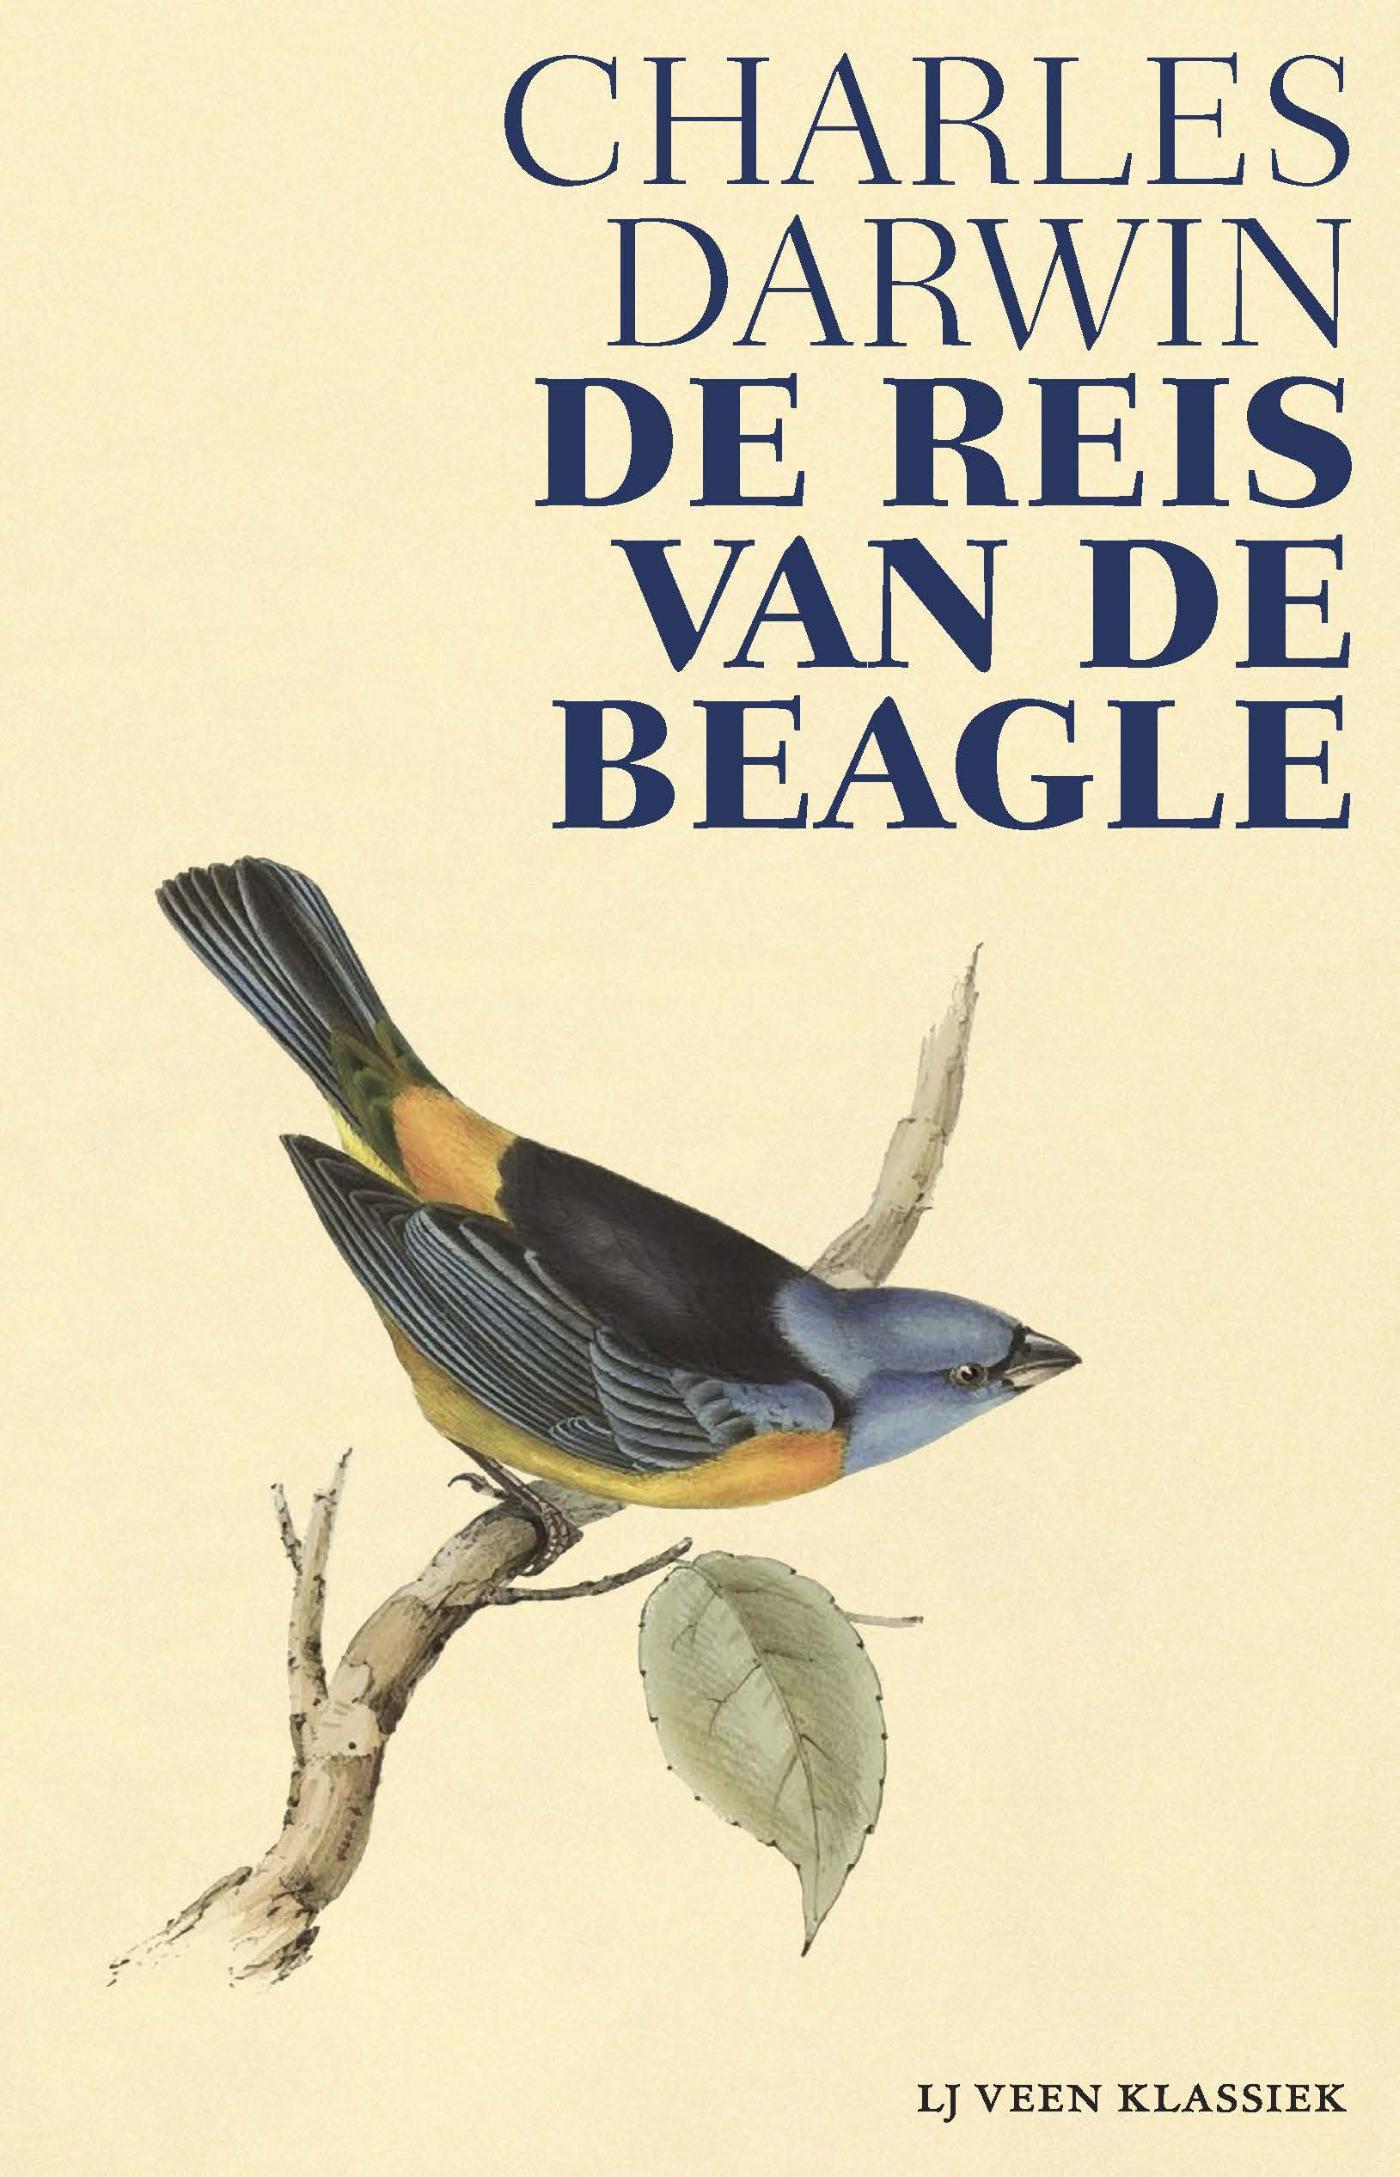 Reisverhaal De Reis van de Beagle | Charles Darwin <br/>€ 17.50 <br/> <a href='https://www.dezwerver.nl/reisgidsen/?tt=1554_252853_241358_&r=https%3A%2F%2Fwww.dezwerver.nl%2Fr%2Fzuid-amerika%2Fecuador%2Fgalapagos-eilanden%2Fc%2Fboeken%2Freisverhalen%2F9789020415650%2Freisverhaal-de-reis-van-de-beagle-charles-darwin%2F' target='_blank'>Meer Info</a>